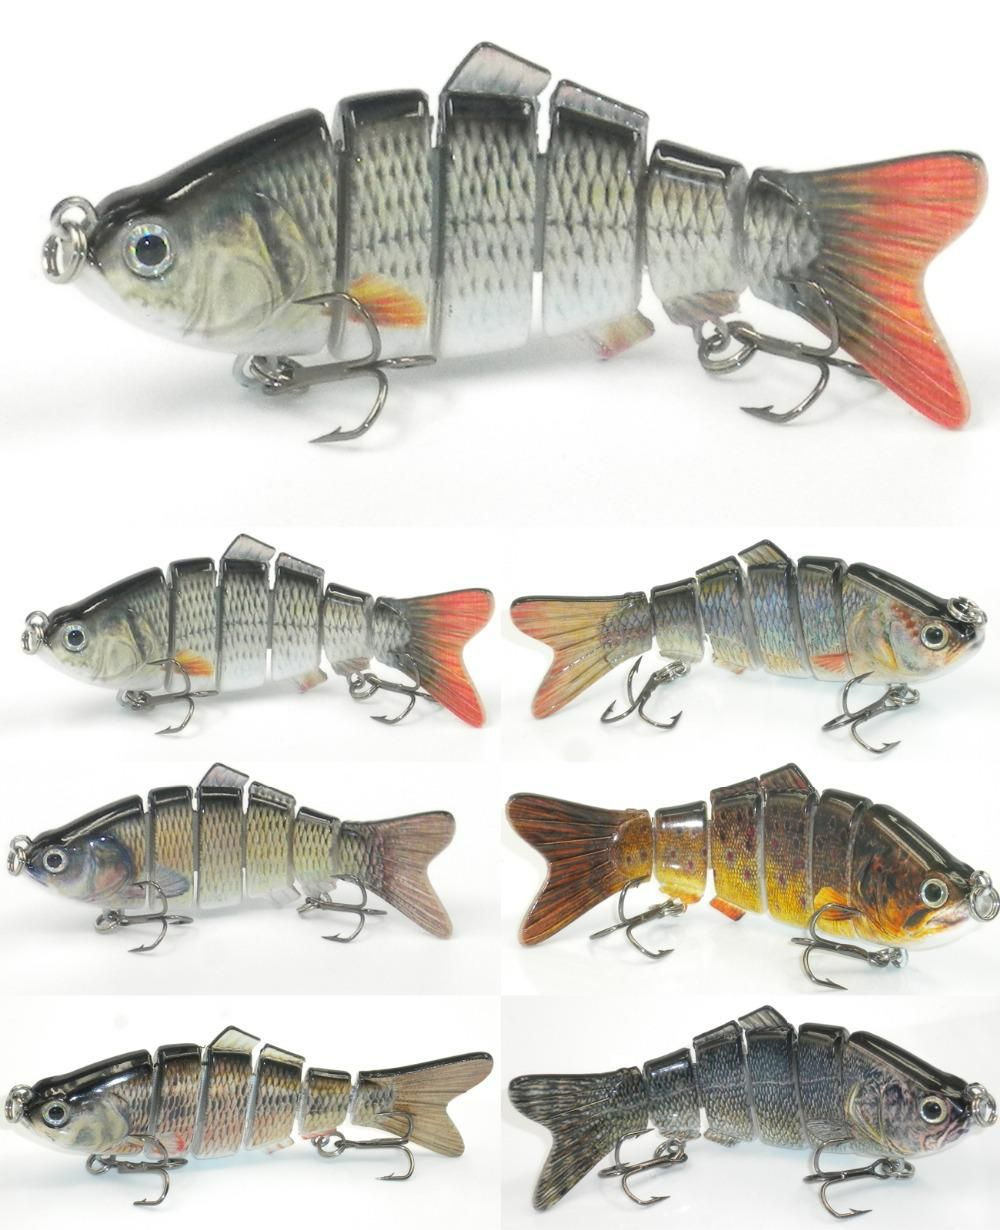 4 inch oz 6 segments swimbait fishing lure for Bass fishing 3d